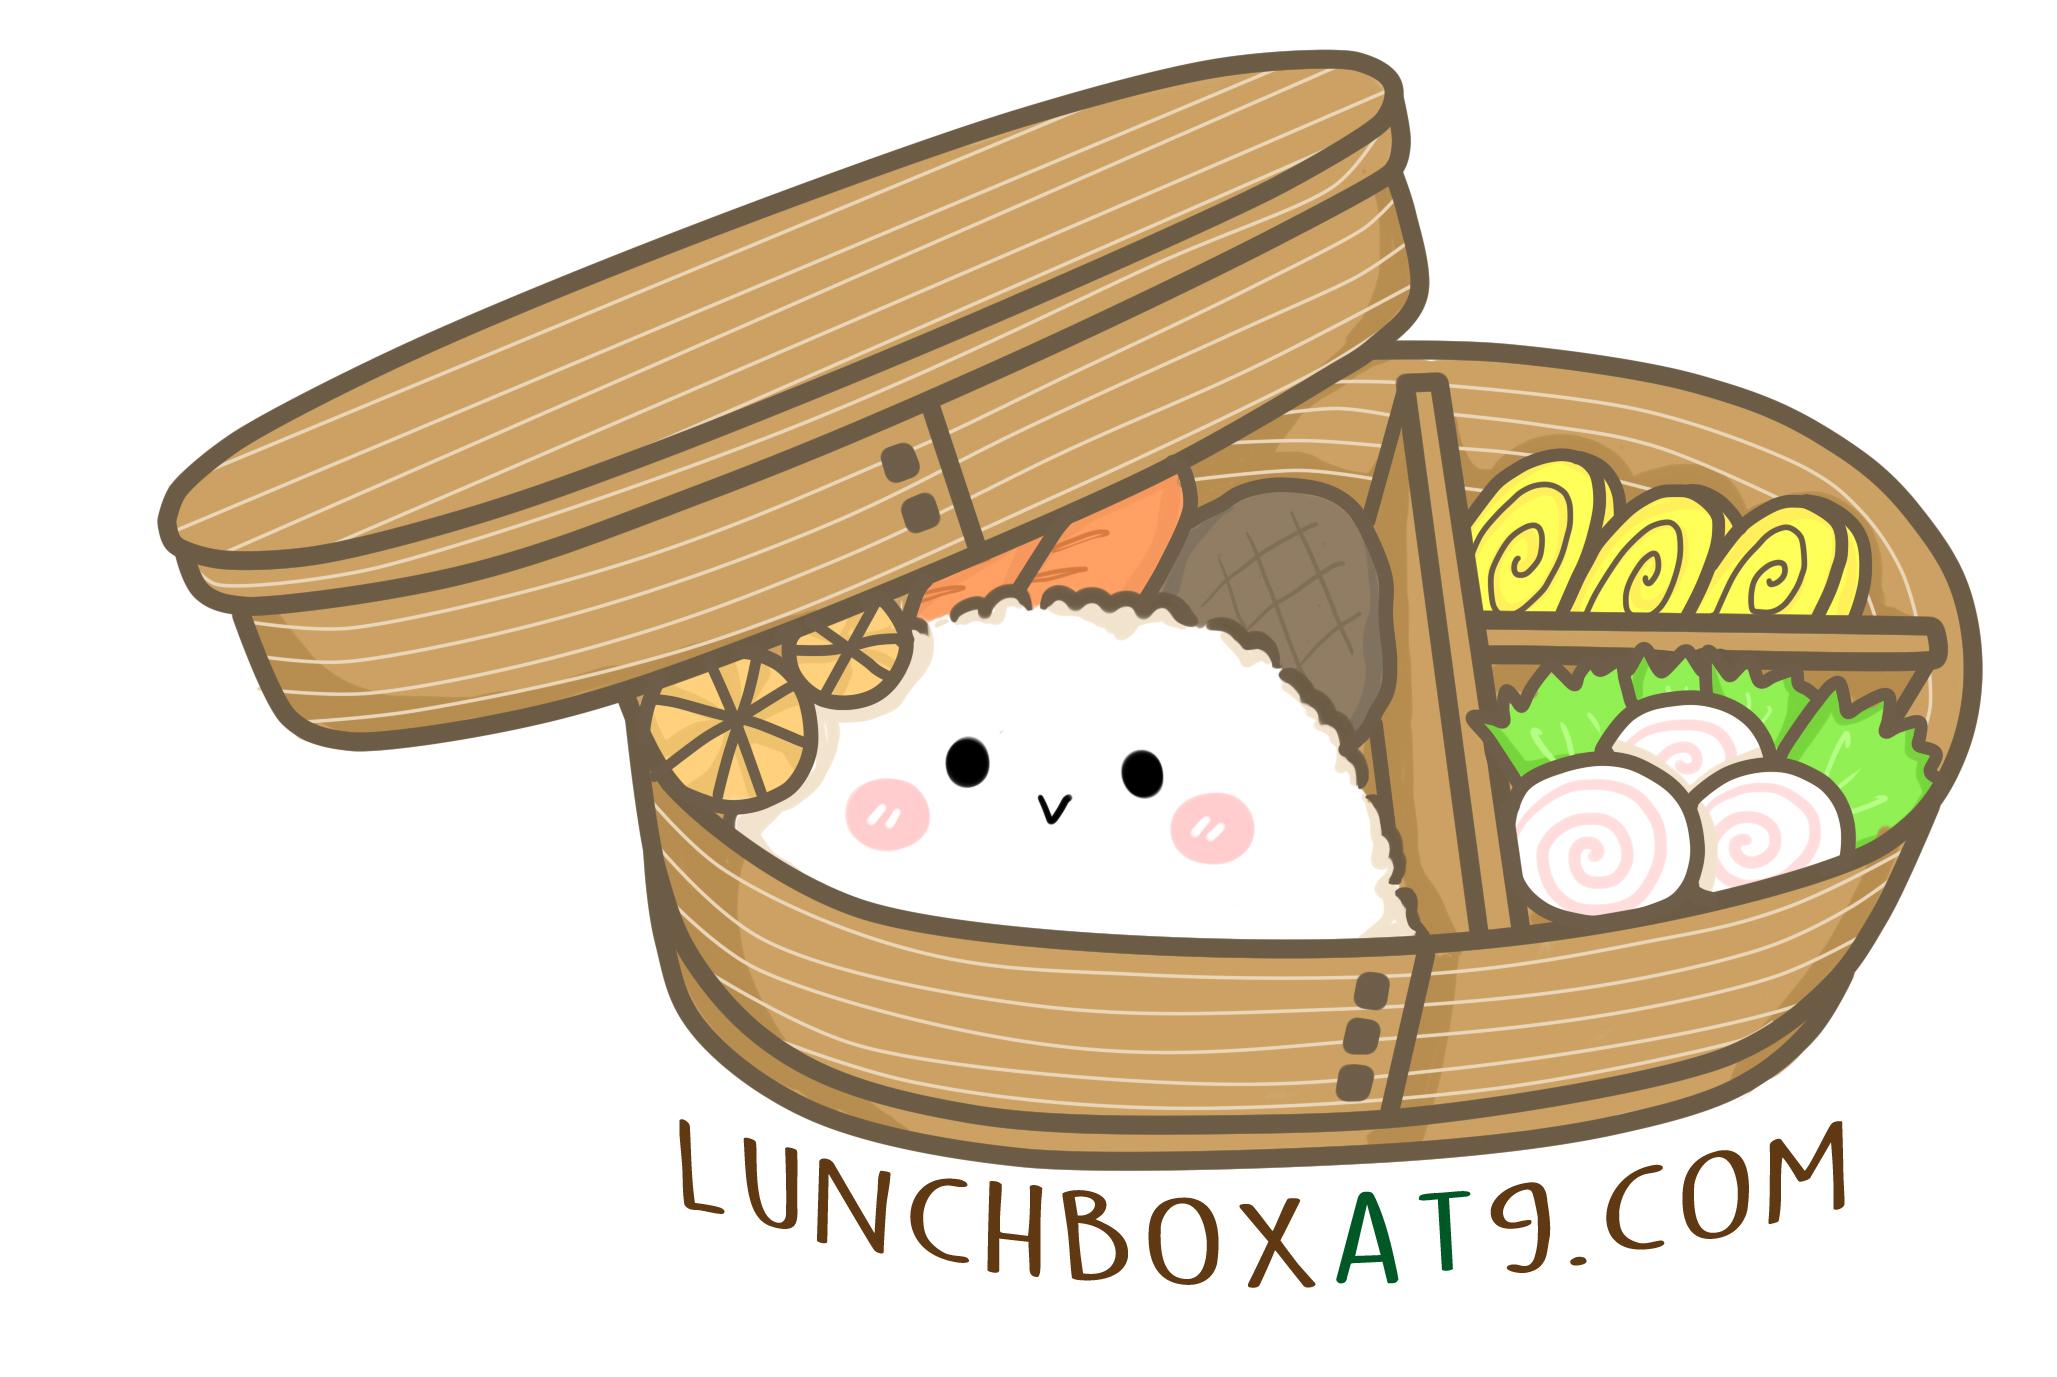 furoshiki,ผาห่อเบนโตะ,ผ้าห่อกล่องข้าว,กล่องข้าว,กล่องข้าวญี่ปุ่น,กล่องข้าวไม้,กล่องข้าวน่ารัก,กล่องข้าวเบนโตะ,ช้อนไม้,ถ้วยไม้,ข้าวกล่อง,ข้าวกล่องไม้,เบนโตะ,กล่องอาหาร,กล่องอาหาร ญี่ปุ่น,Lunchbox,Bento,bento box,กล่องข้าว พร้อมส่ง,เบนโตะ พร้อมส่ง,bentobox พร้อมส่ง